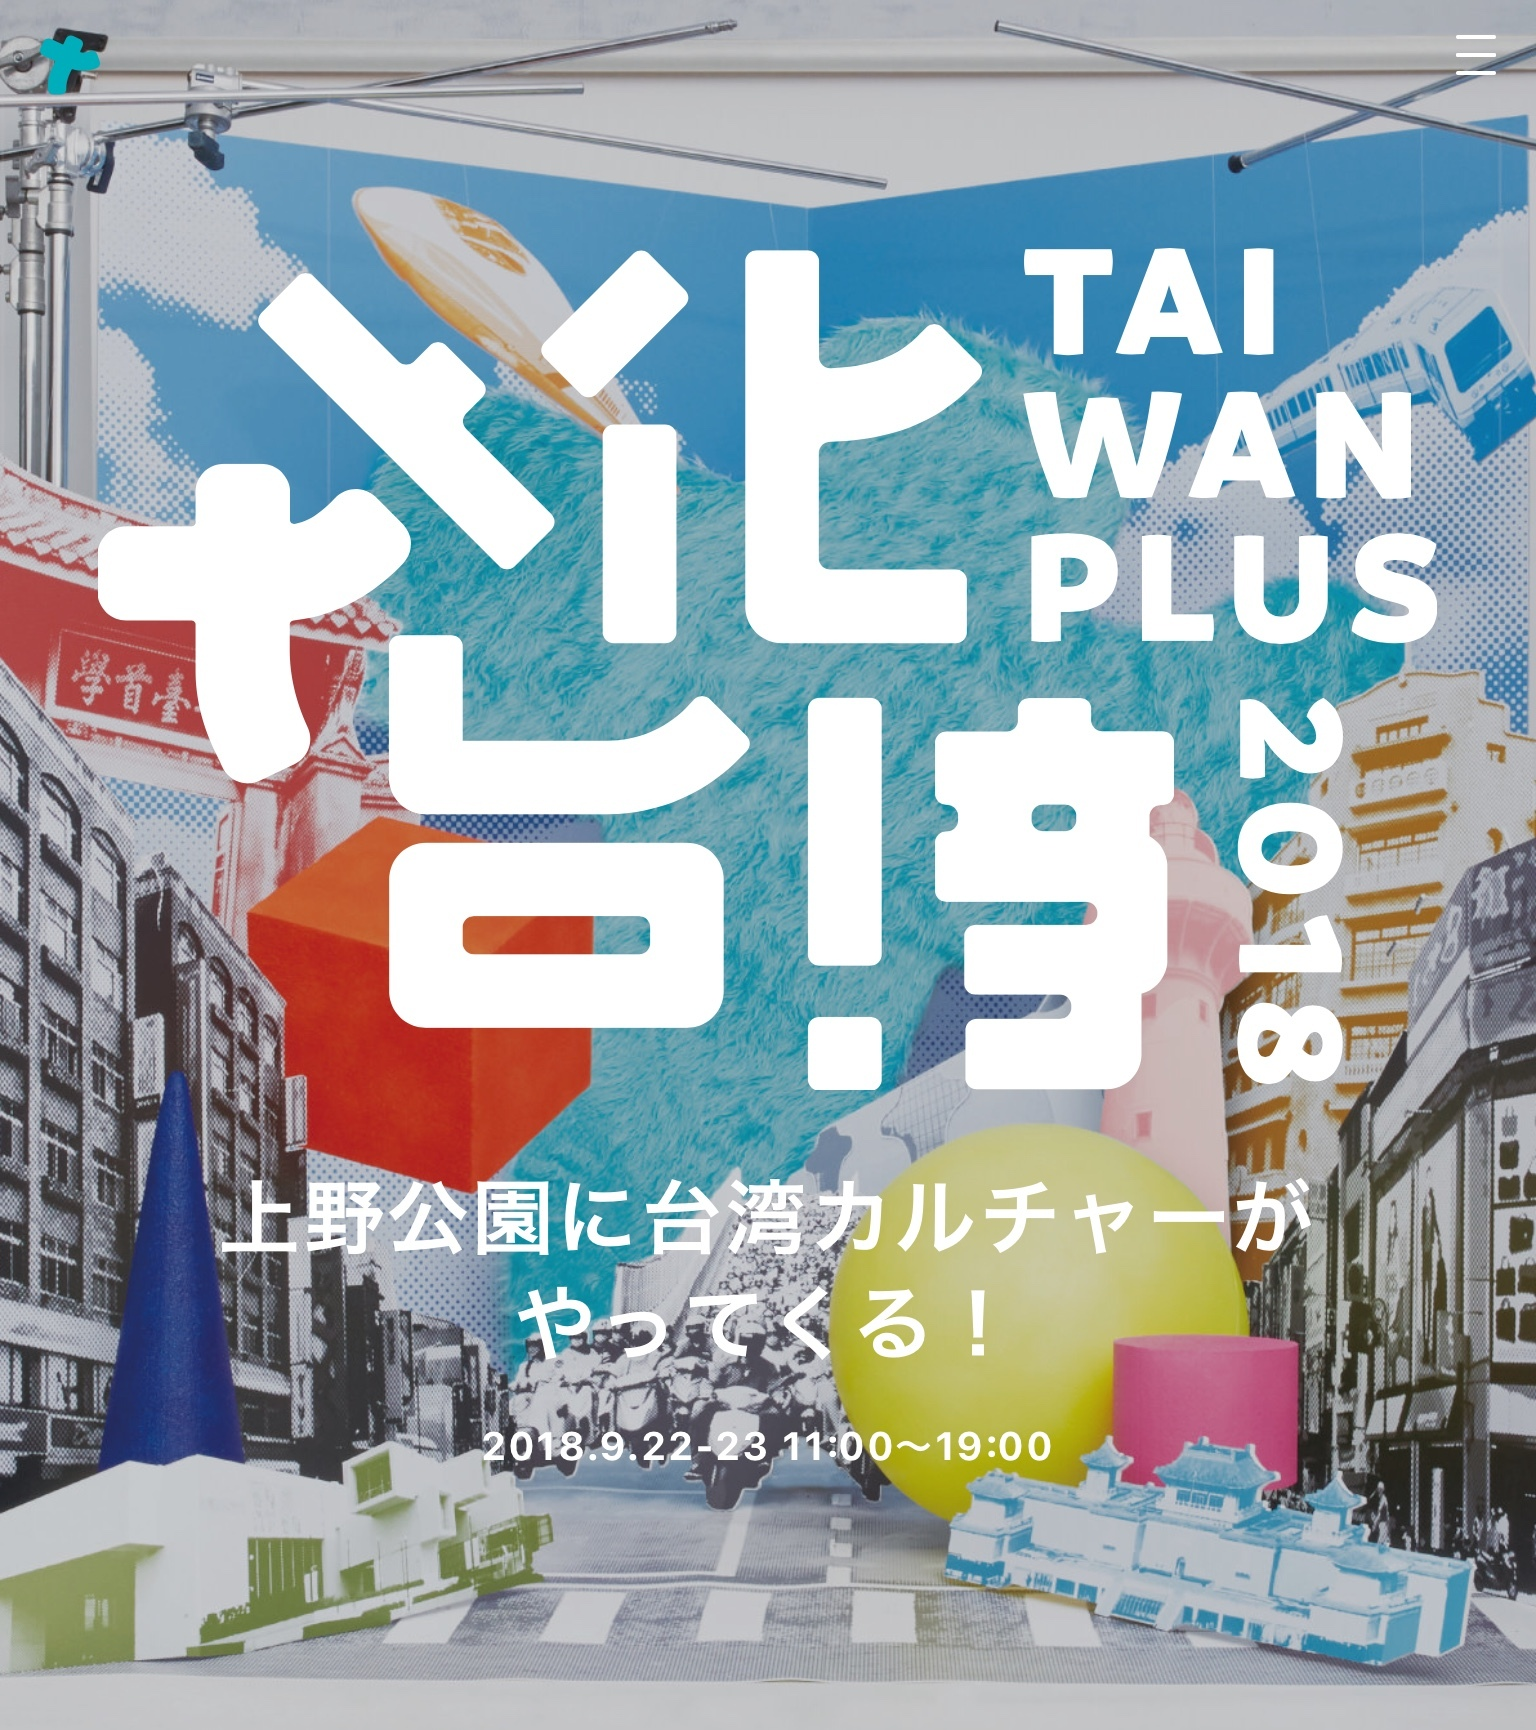 9/22、23 『Taiwan Plus 2018 文化台湾』晒日子の展示会場で古来種野菜を展示します。